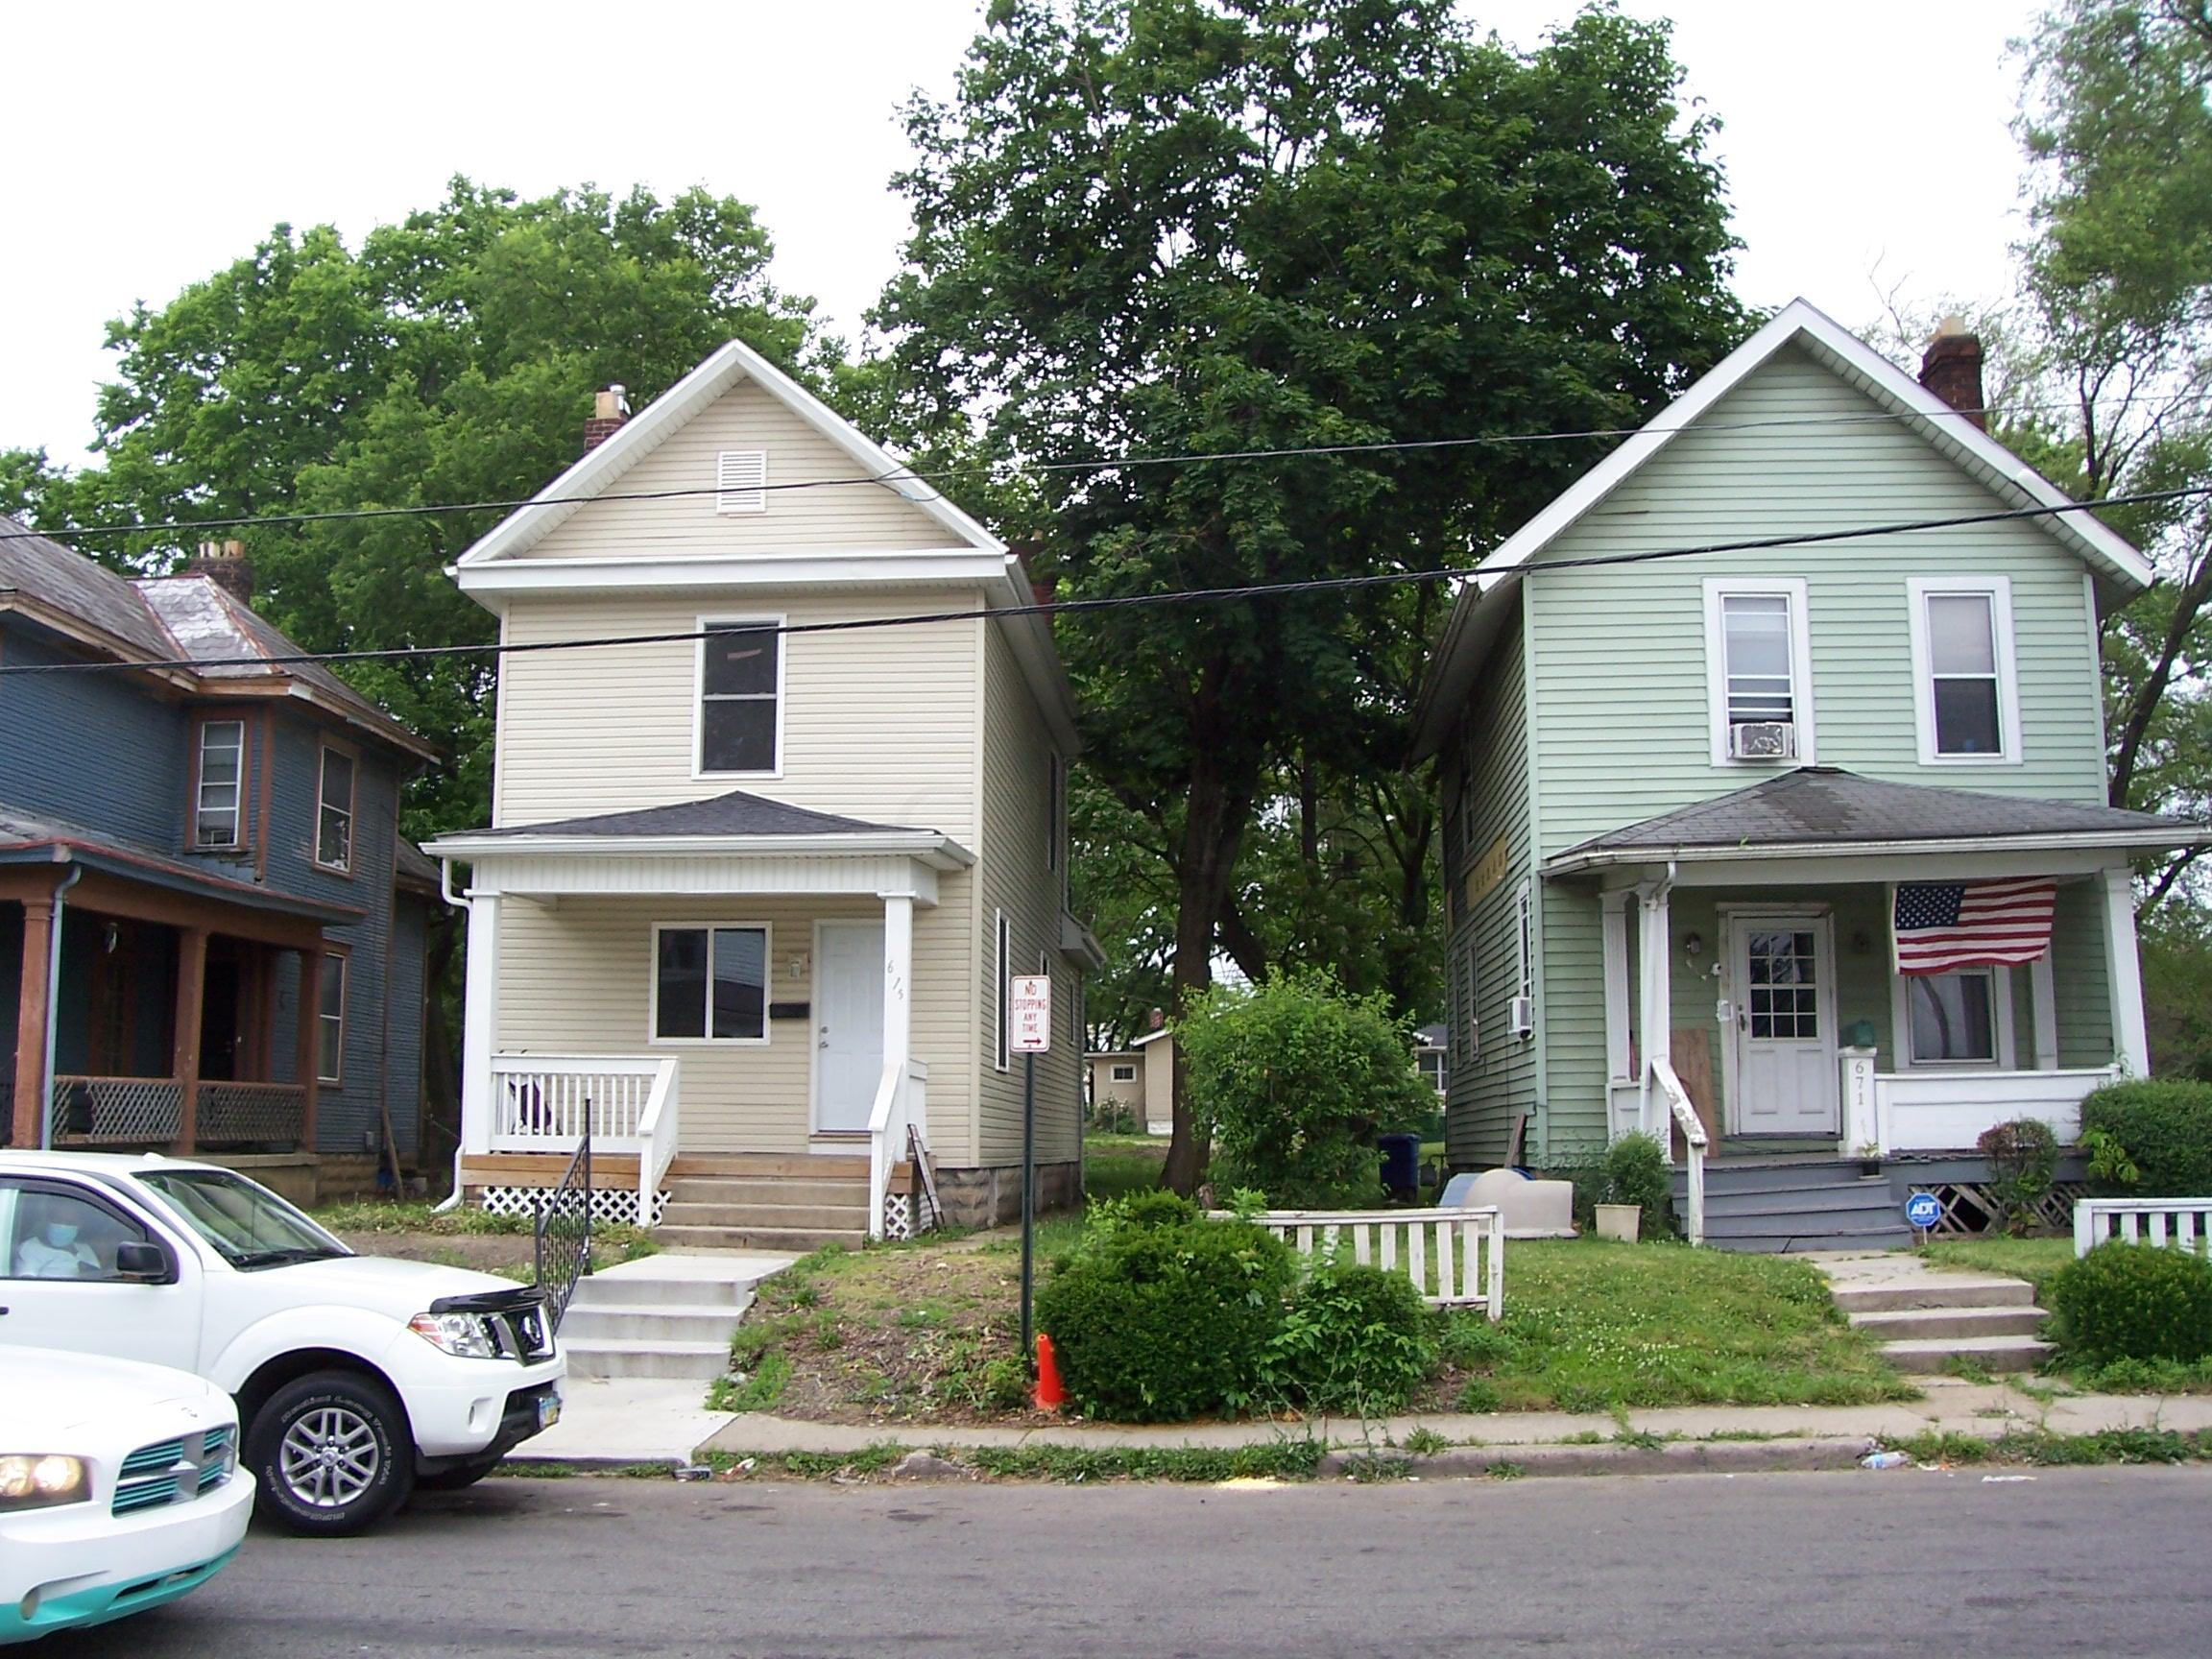 675 Kelton Avenue, Columbus, Ohio 43205, 2 Bedrooms Bedrooms, ,2 BathroomsBathrooms,Residential,For Sale,Kelton,220018105